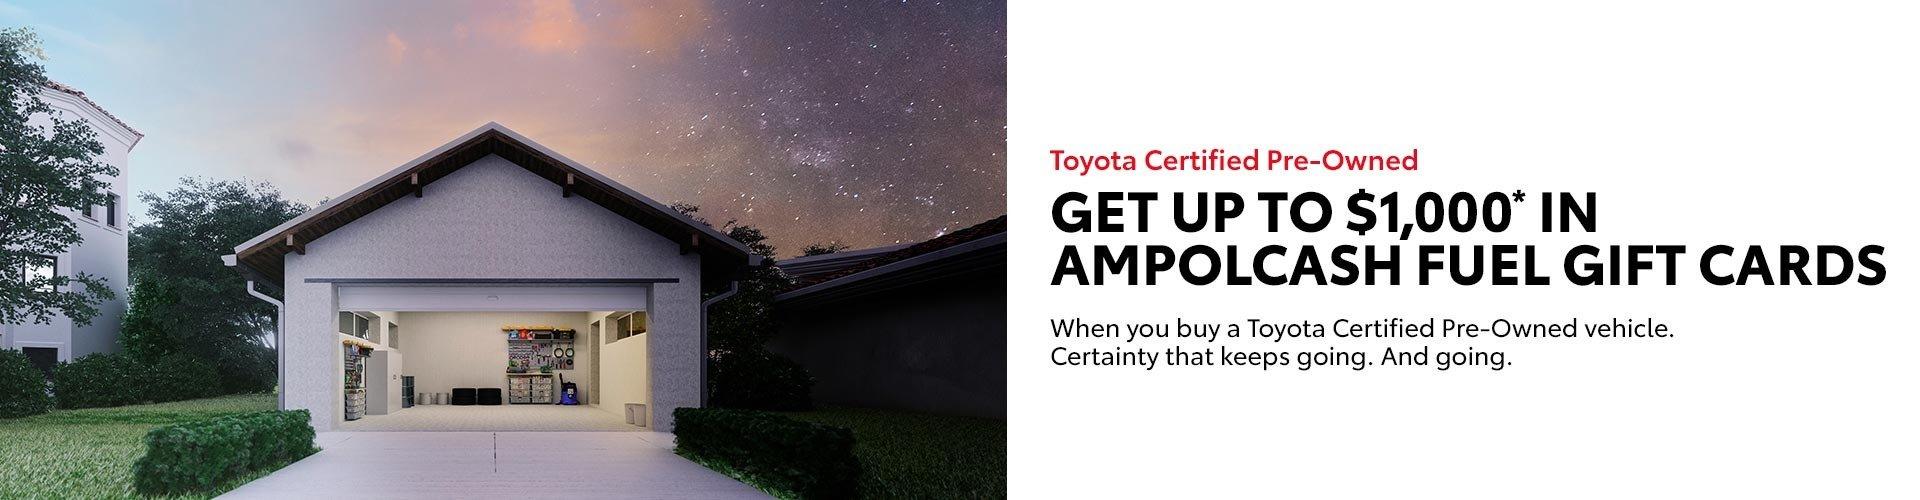 Benalla Toyota - Ampol Fuel Gift Card